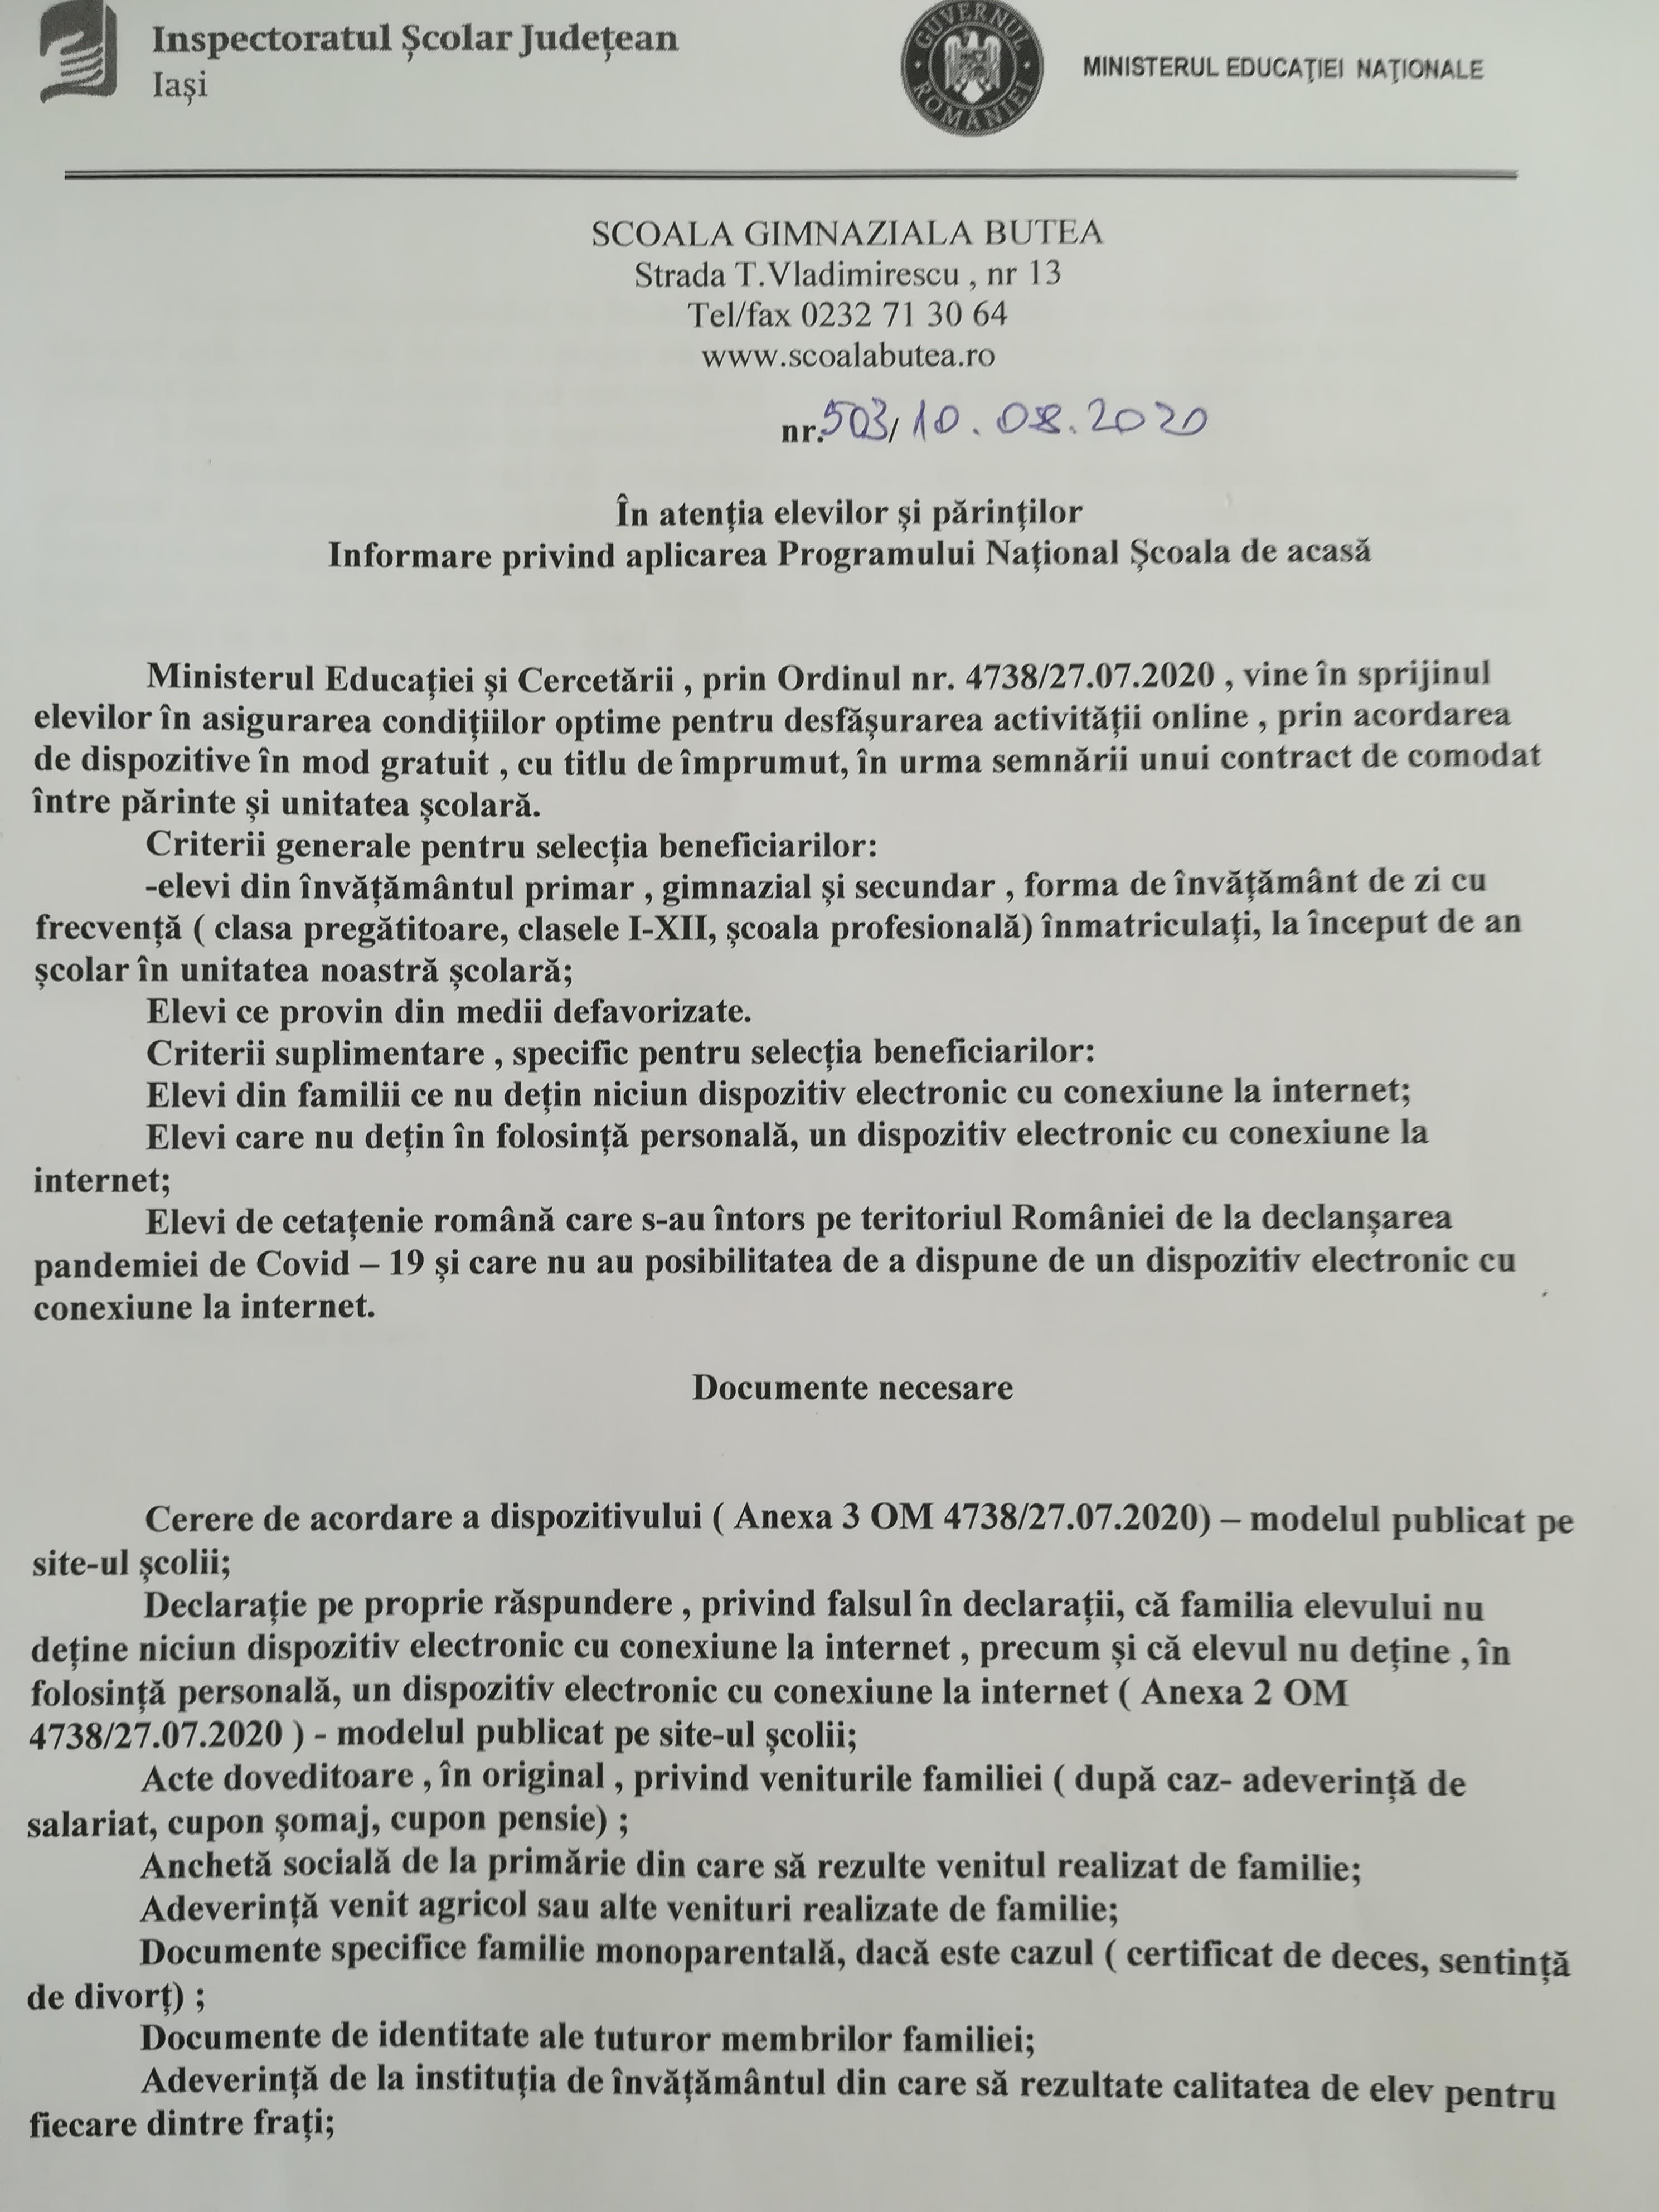 PG 1 SCOALA DE ACASA